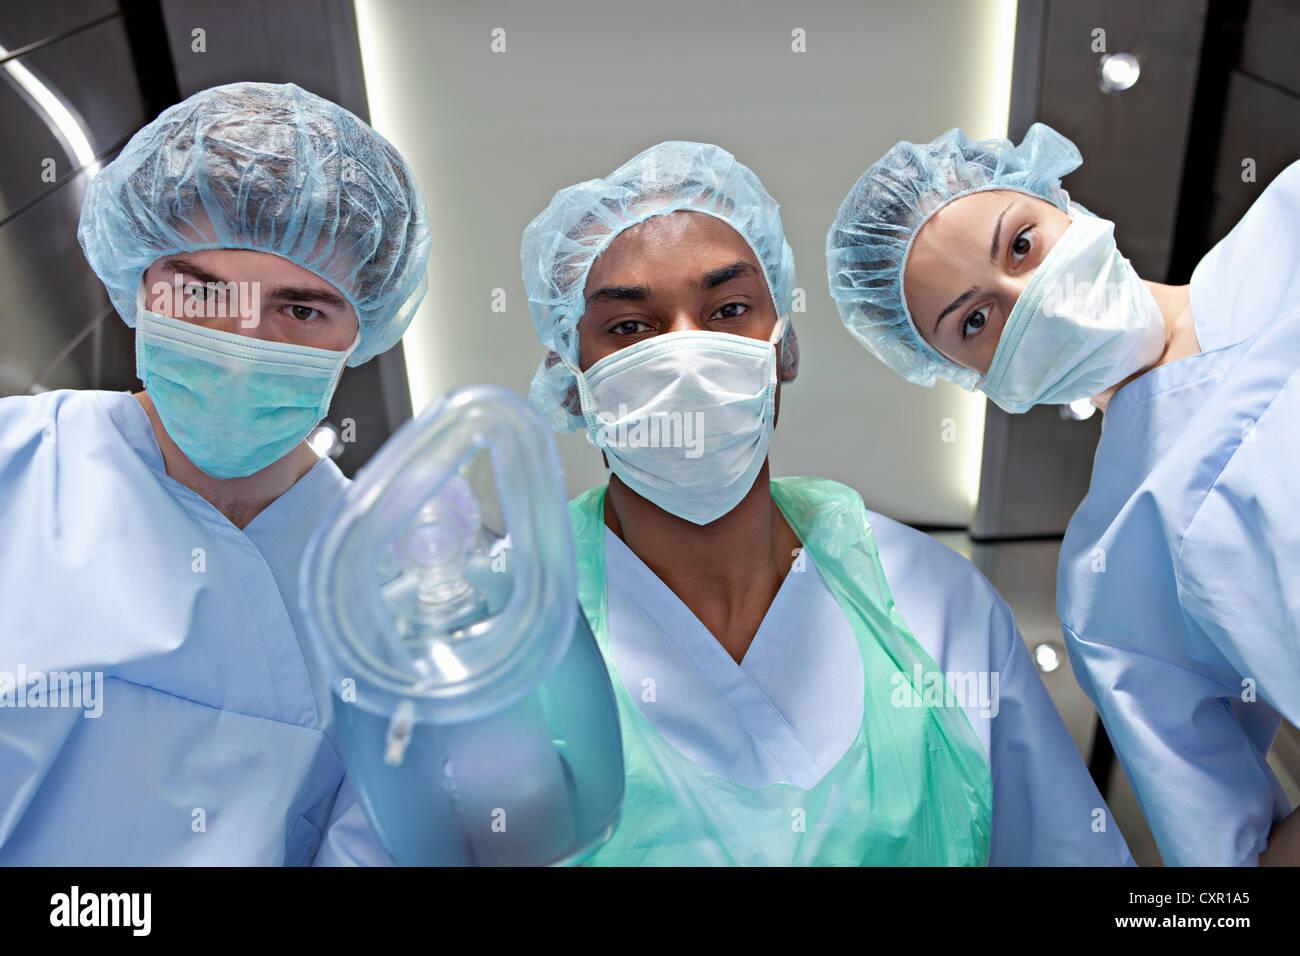 Großartig Anästhesist Vs Anästhesist Ideen - Menschliche Anatomie ...